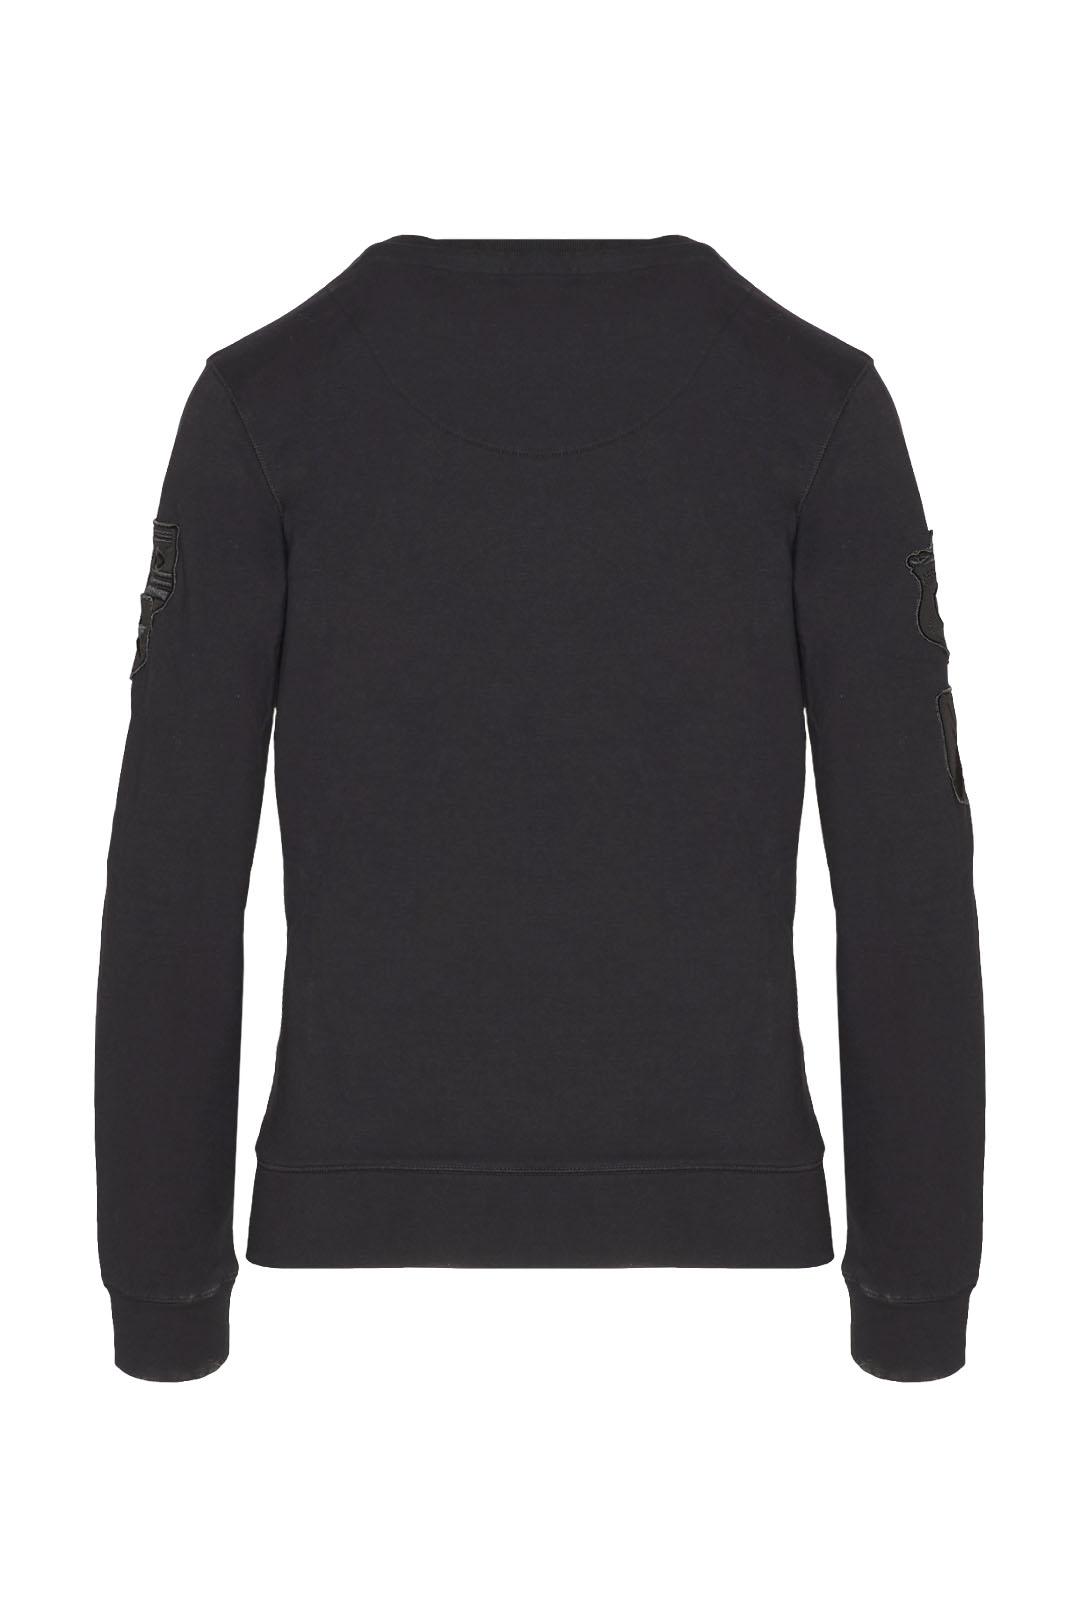 Sweatshirt multipatch à col rond         2